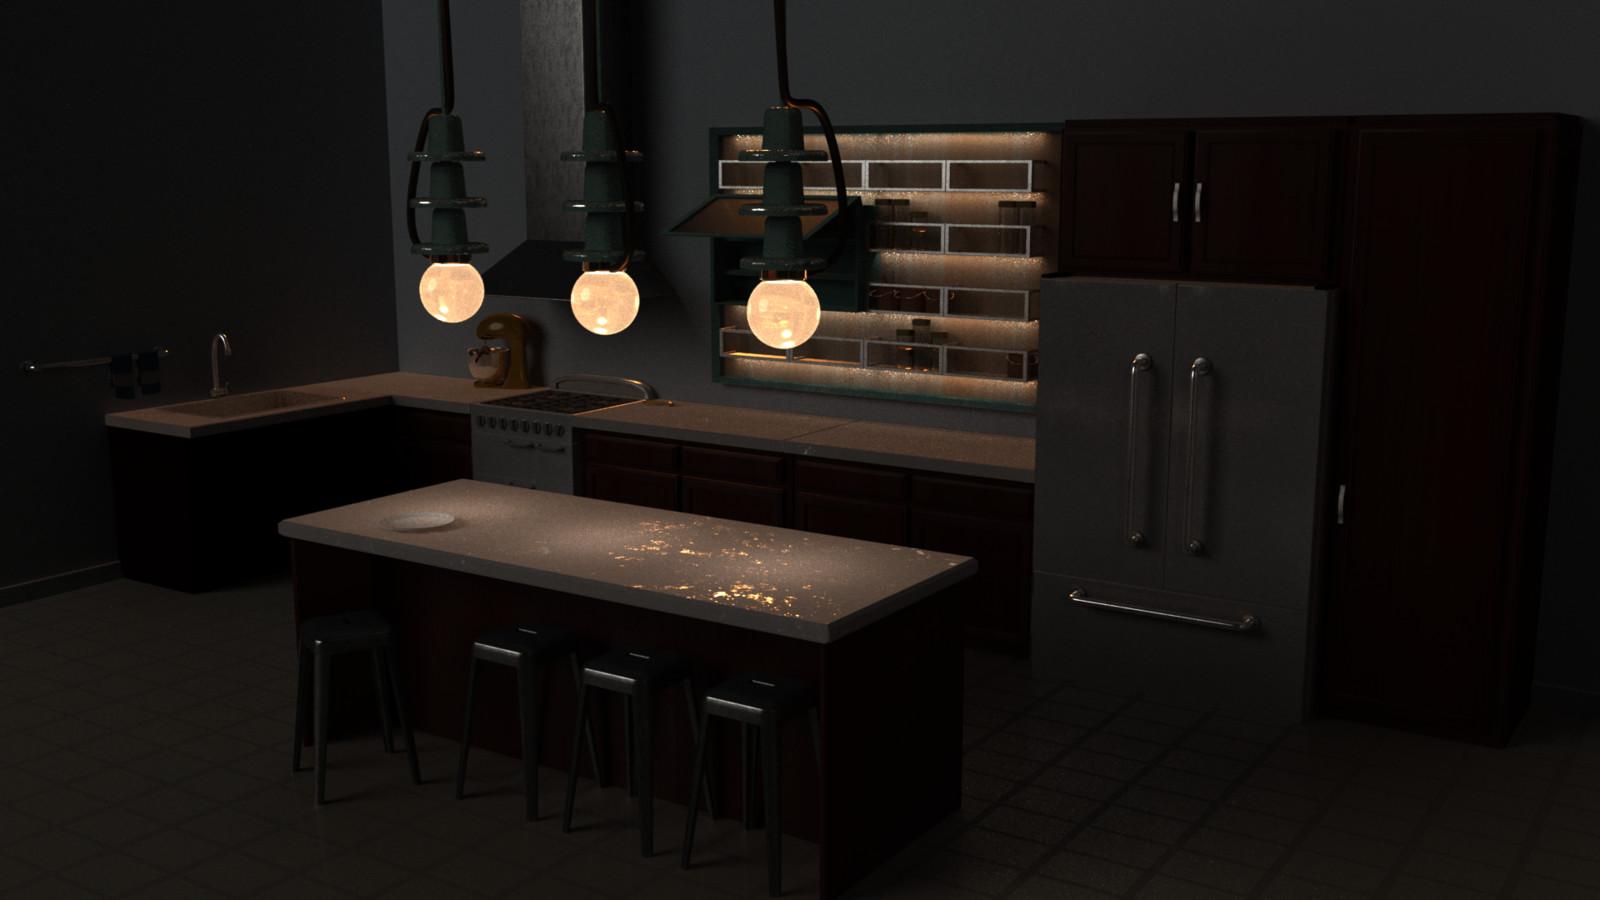 Kitchen Environment